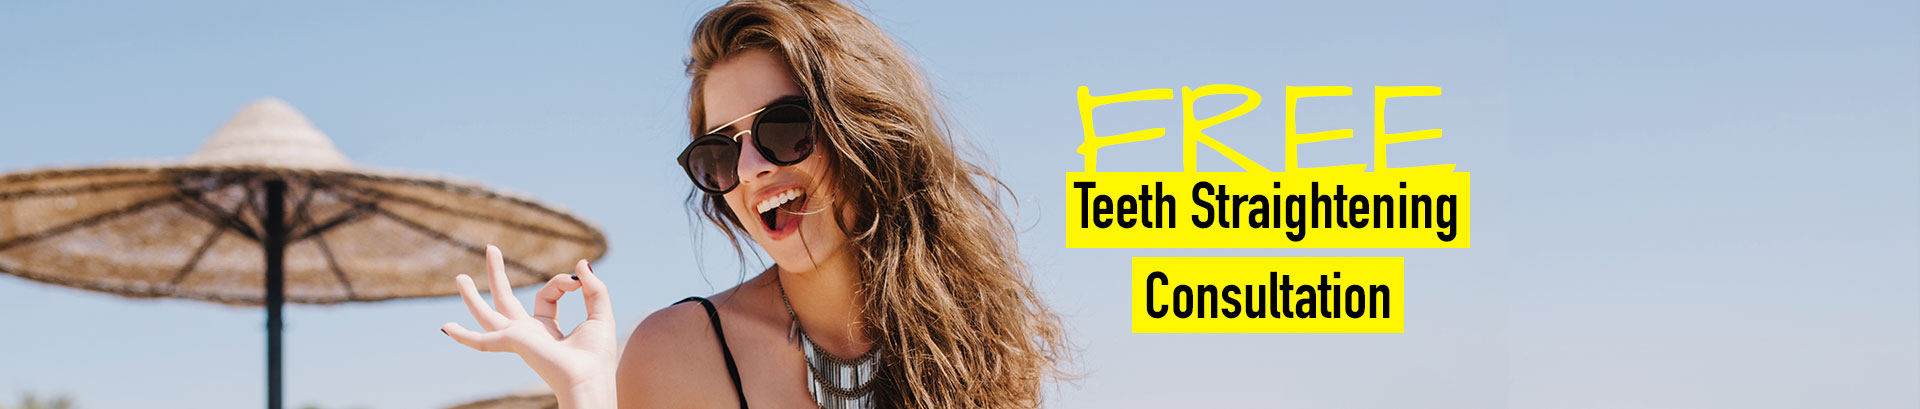 Free orthodontic consultation-teeth straightening London